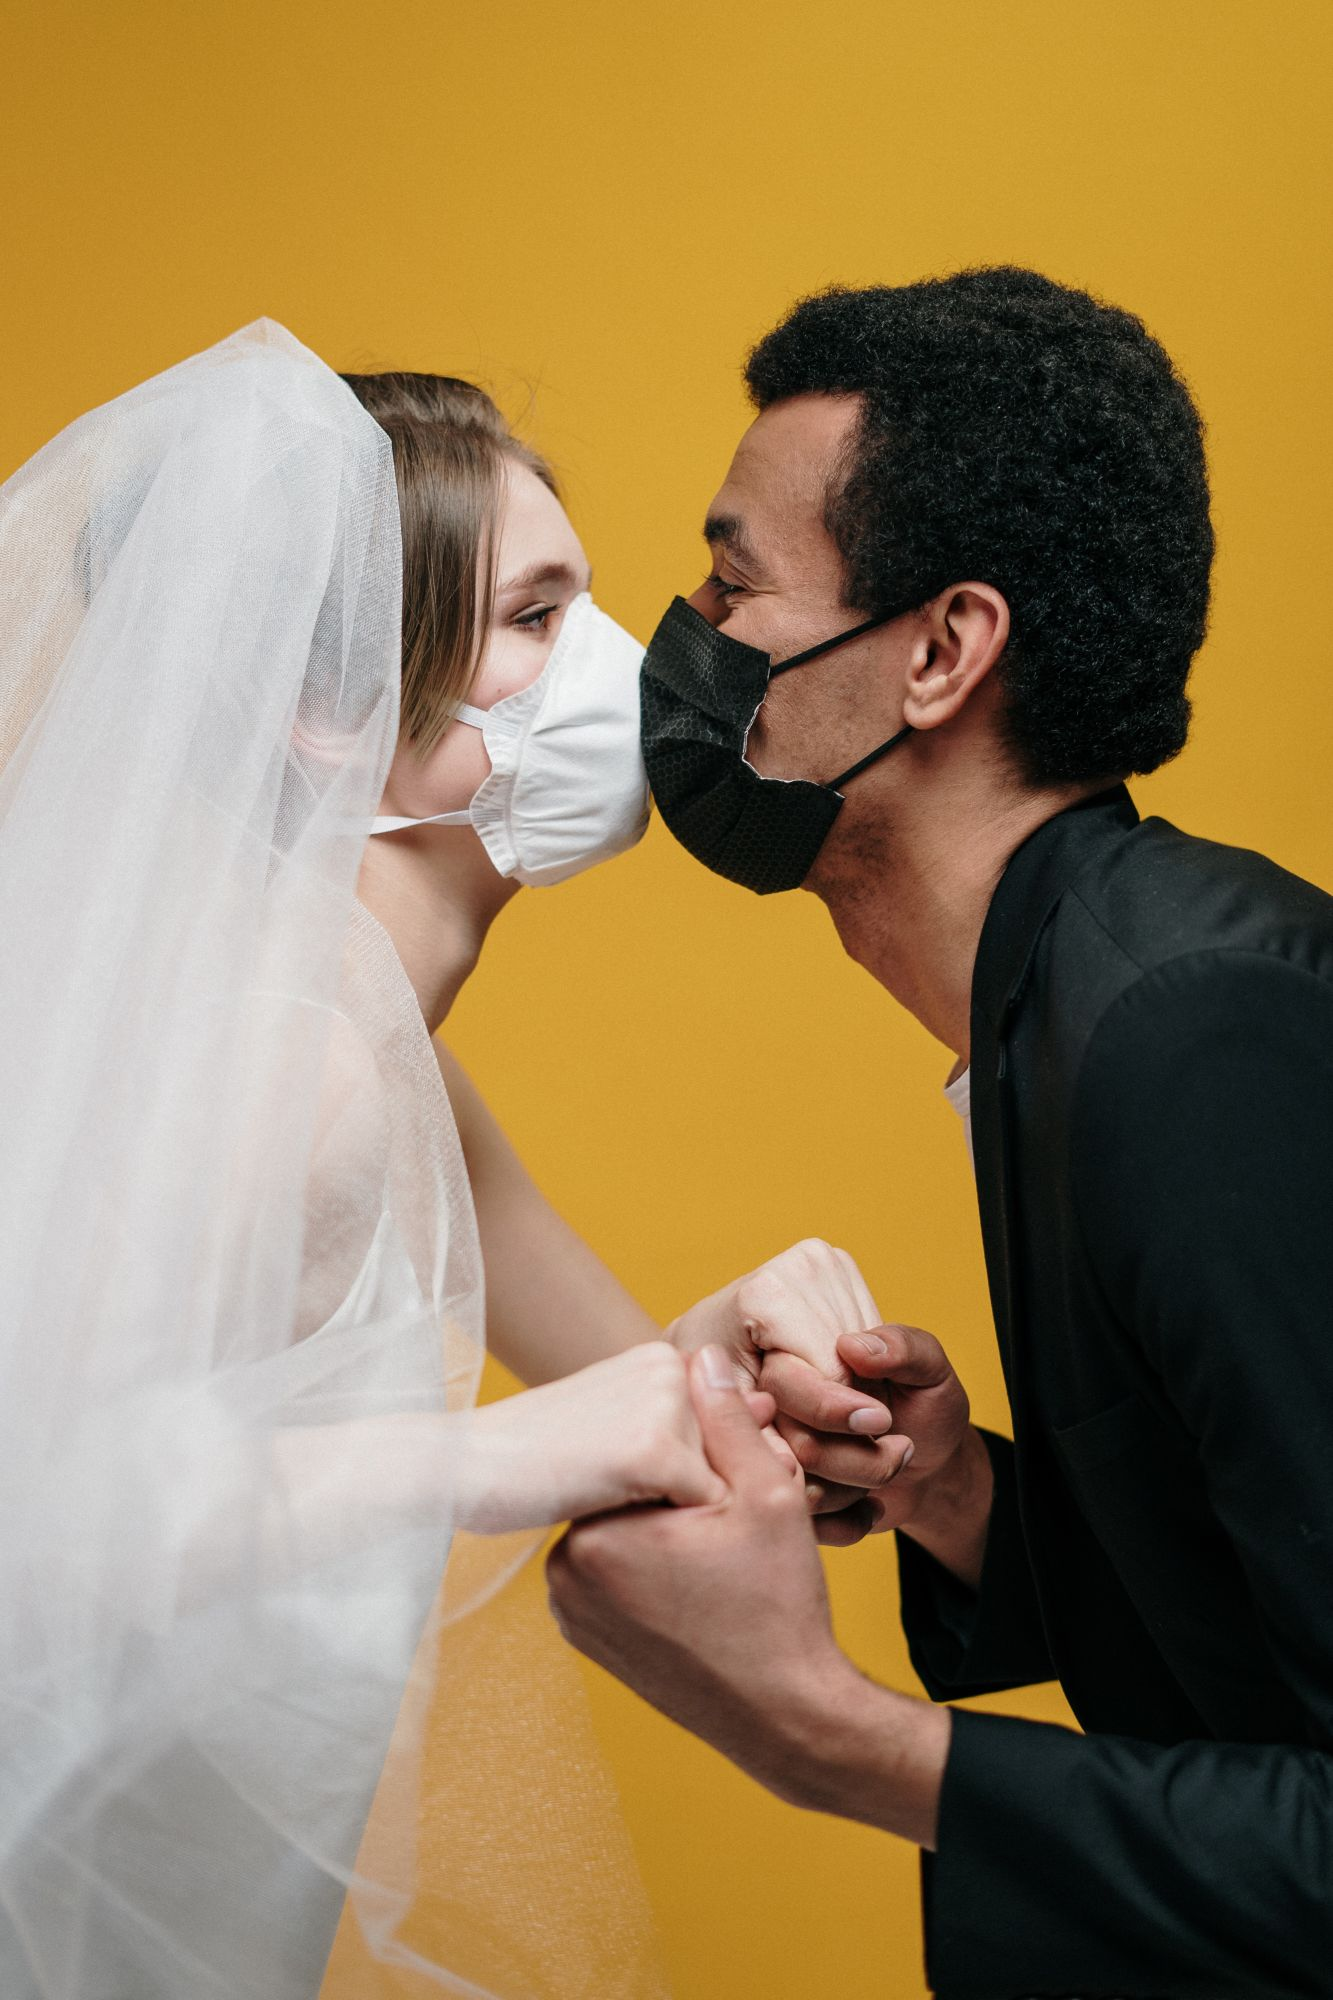 Mariage confinement coronavirus